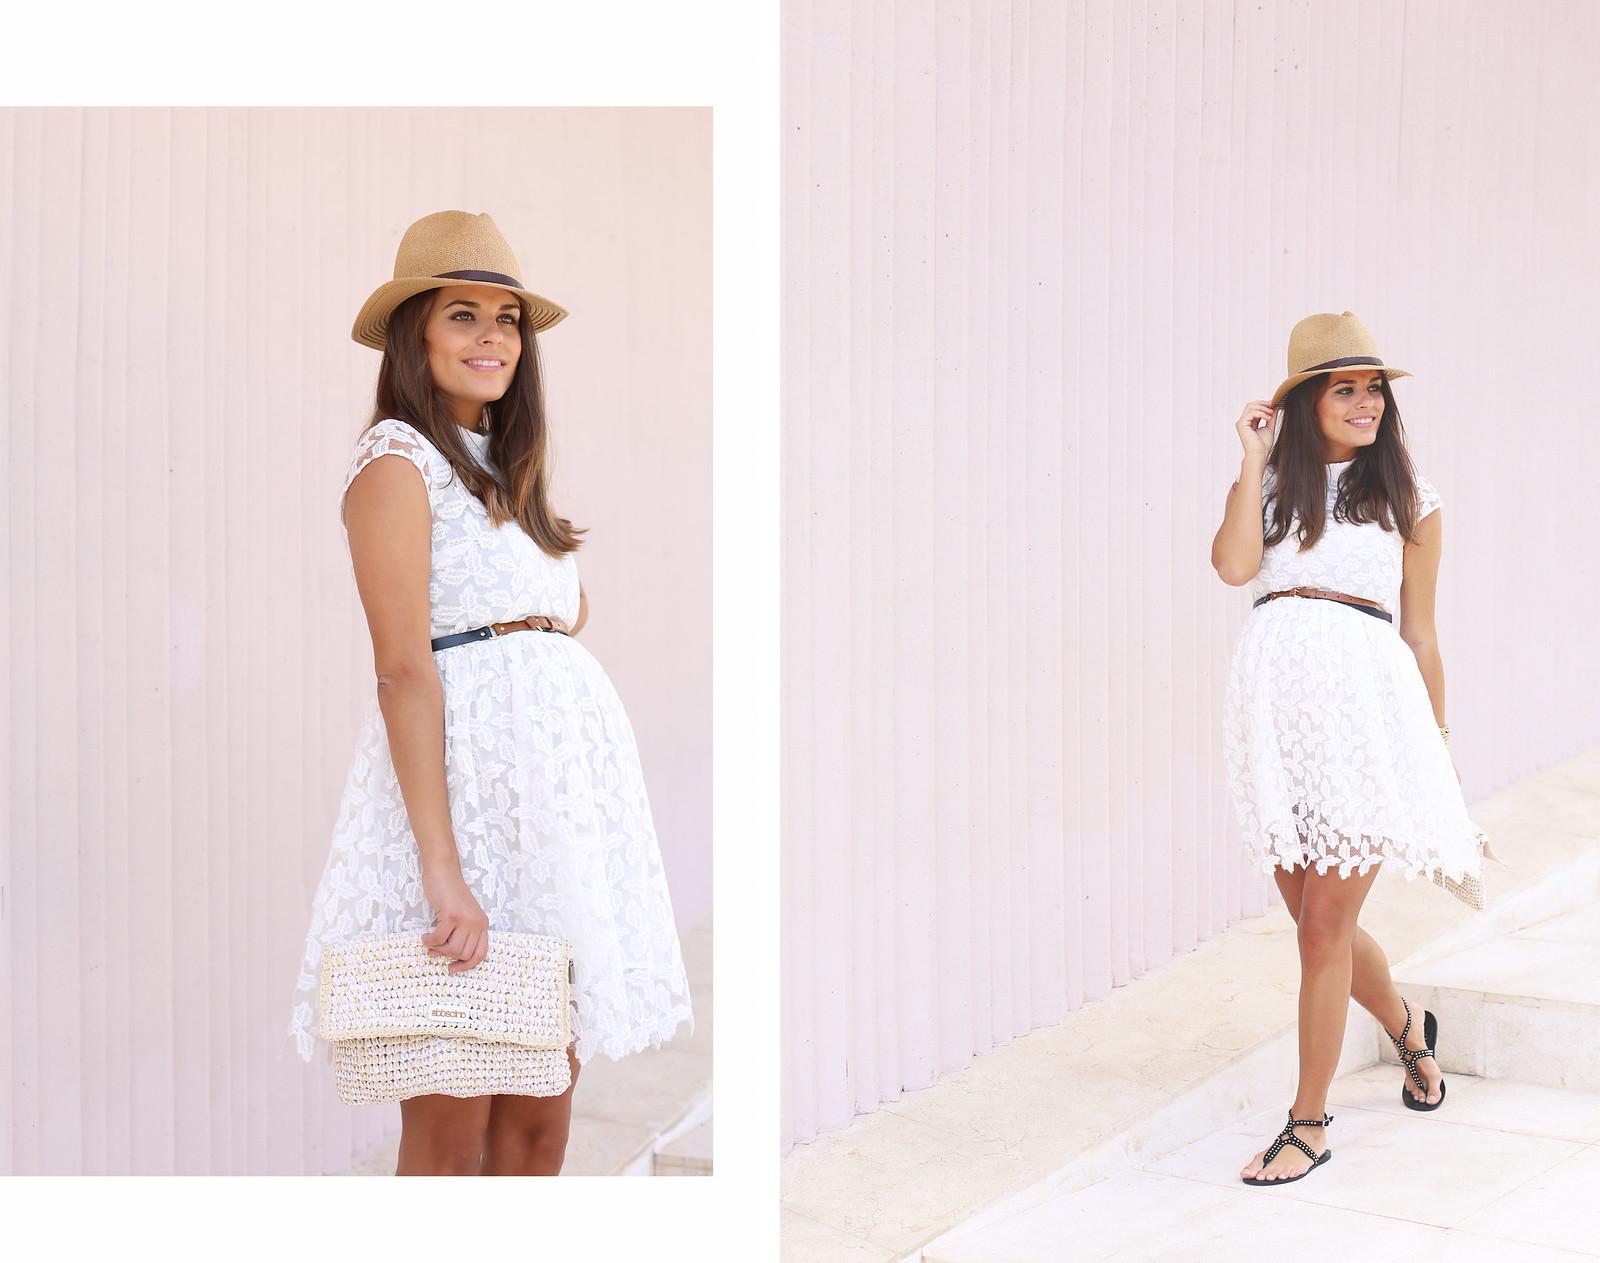 9. lace white short dress - jessie chanes - pregnancy